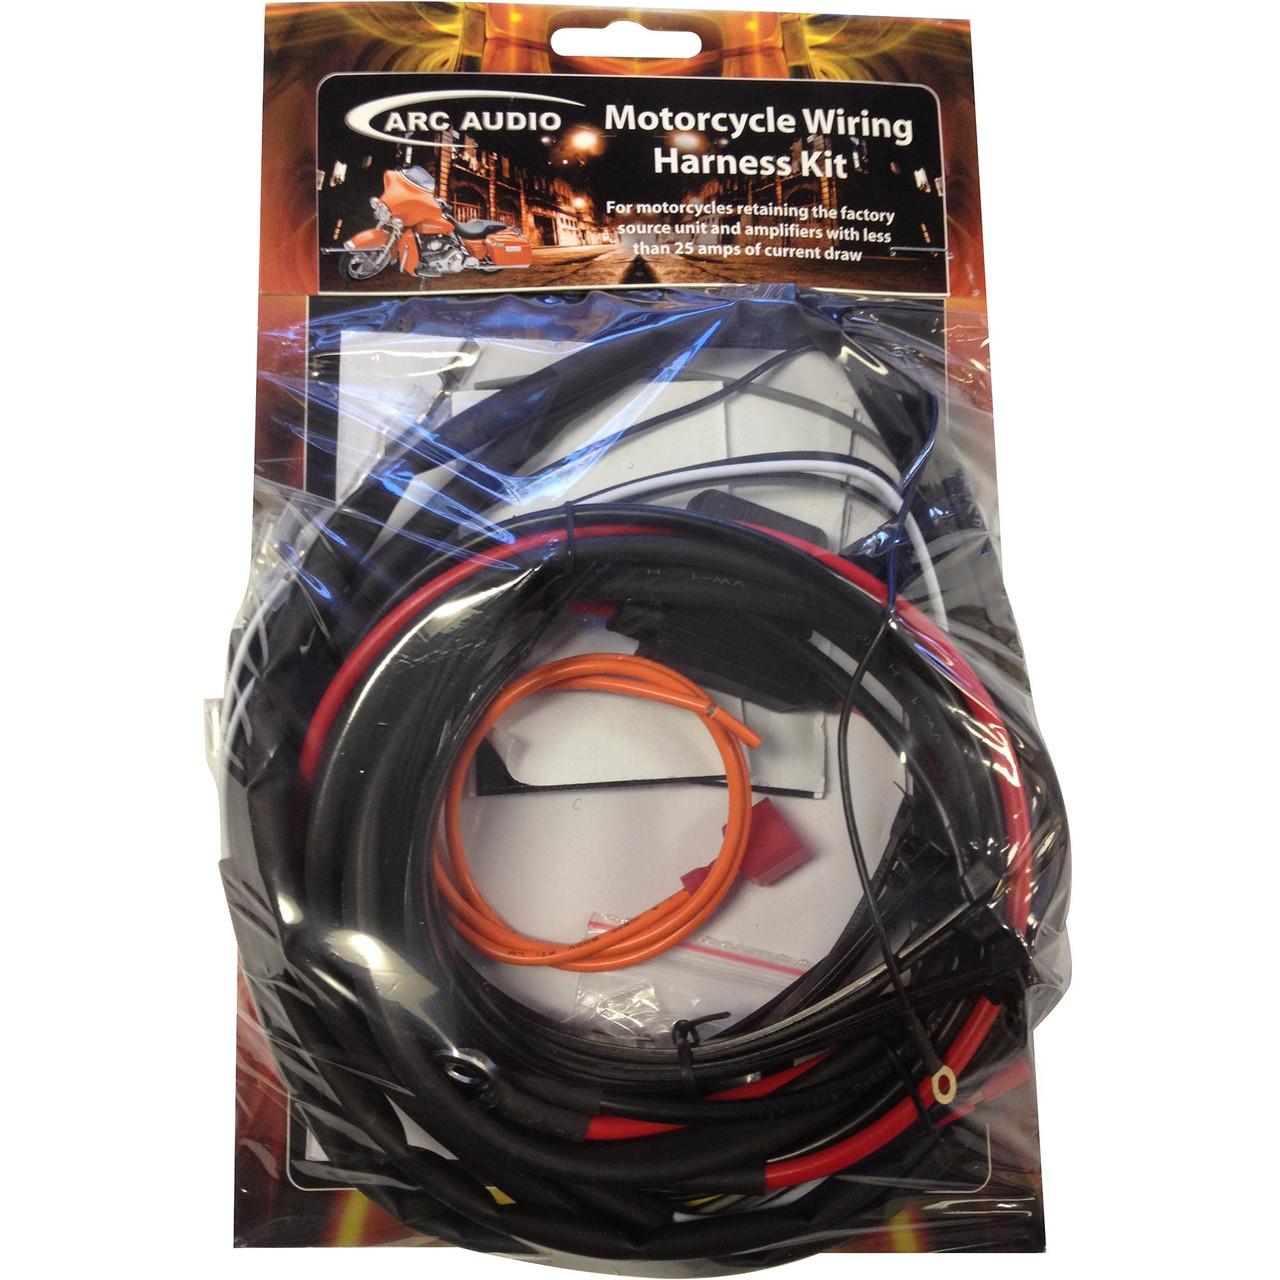 hight resolution of home wiring dynamic audio video llc jamie gannon